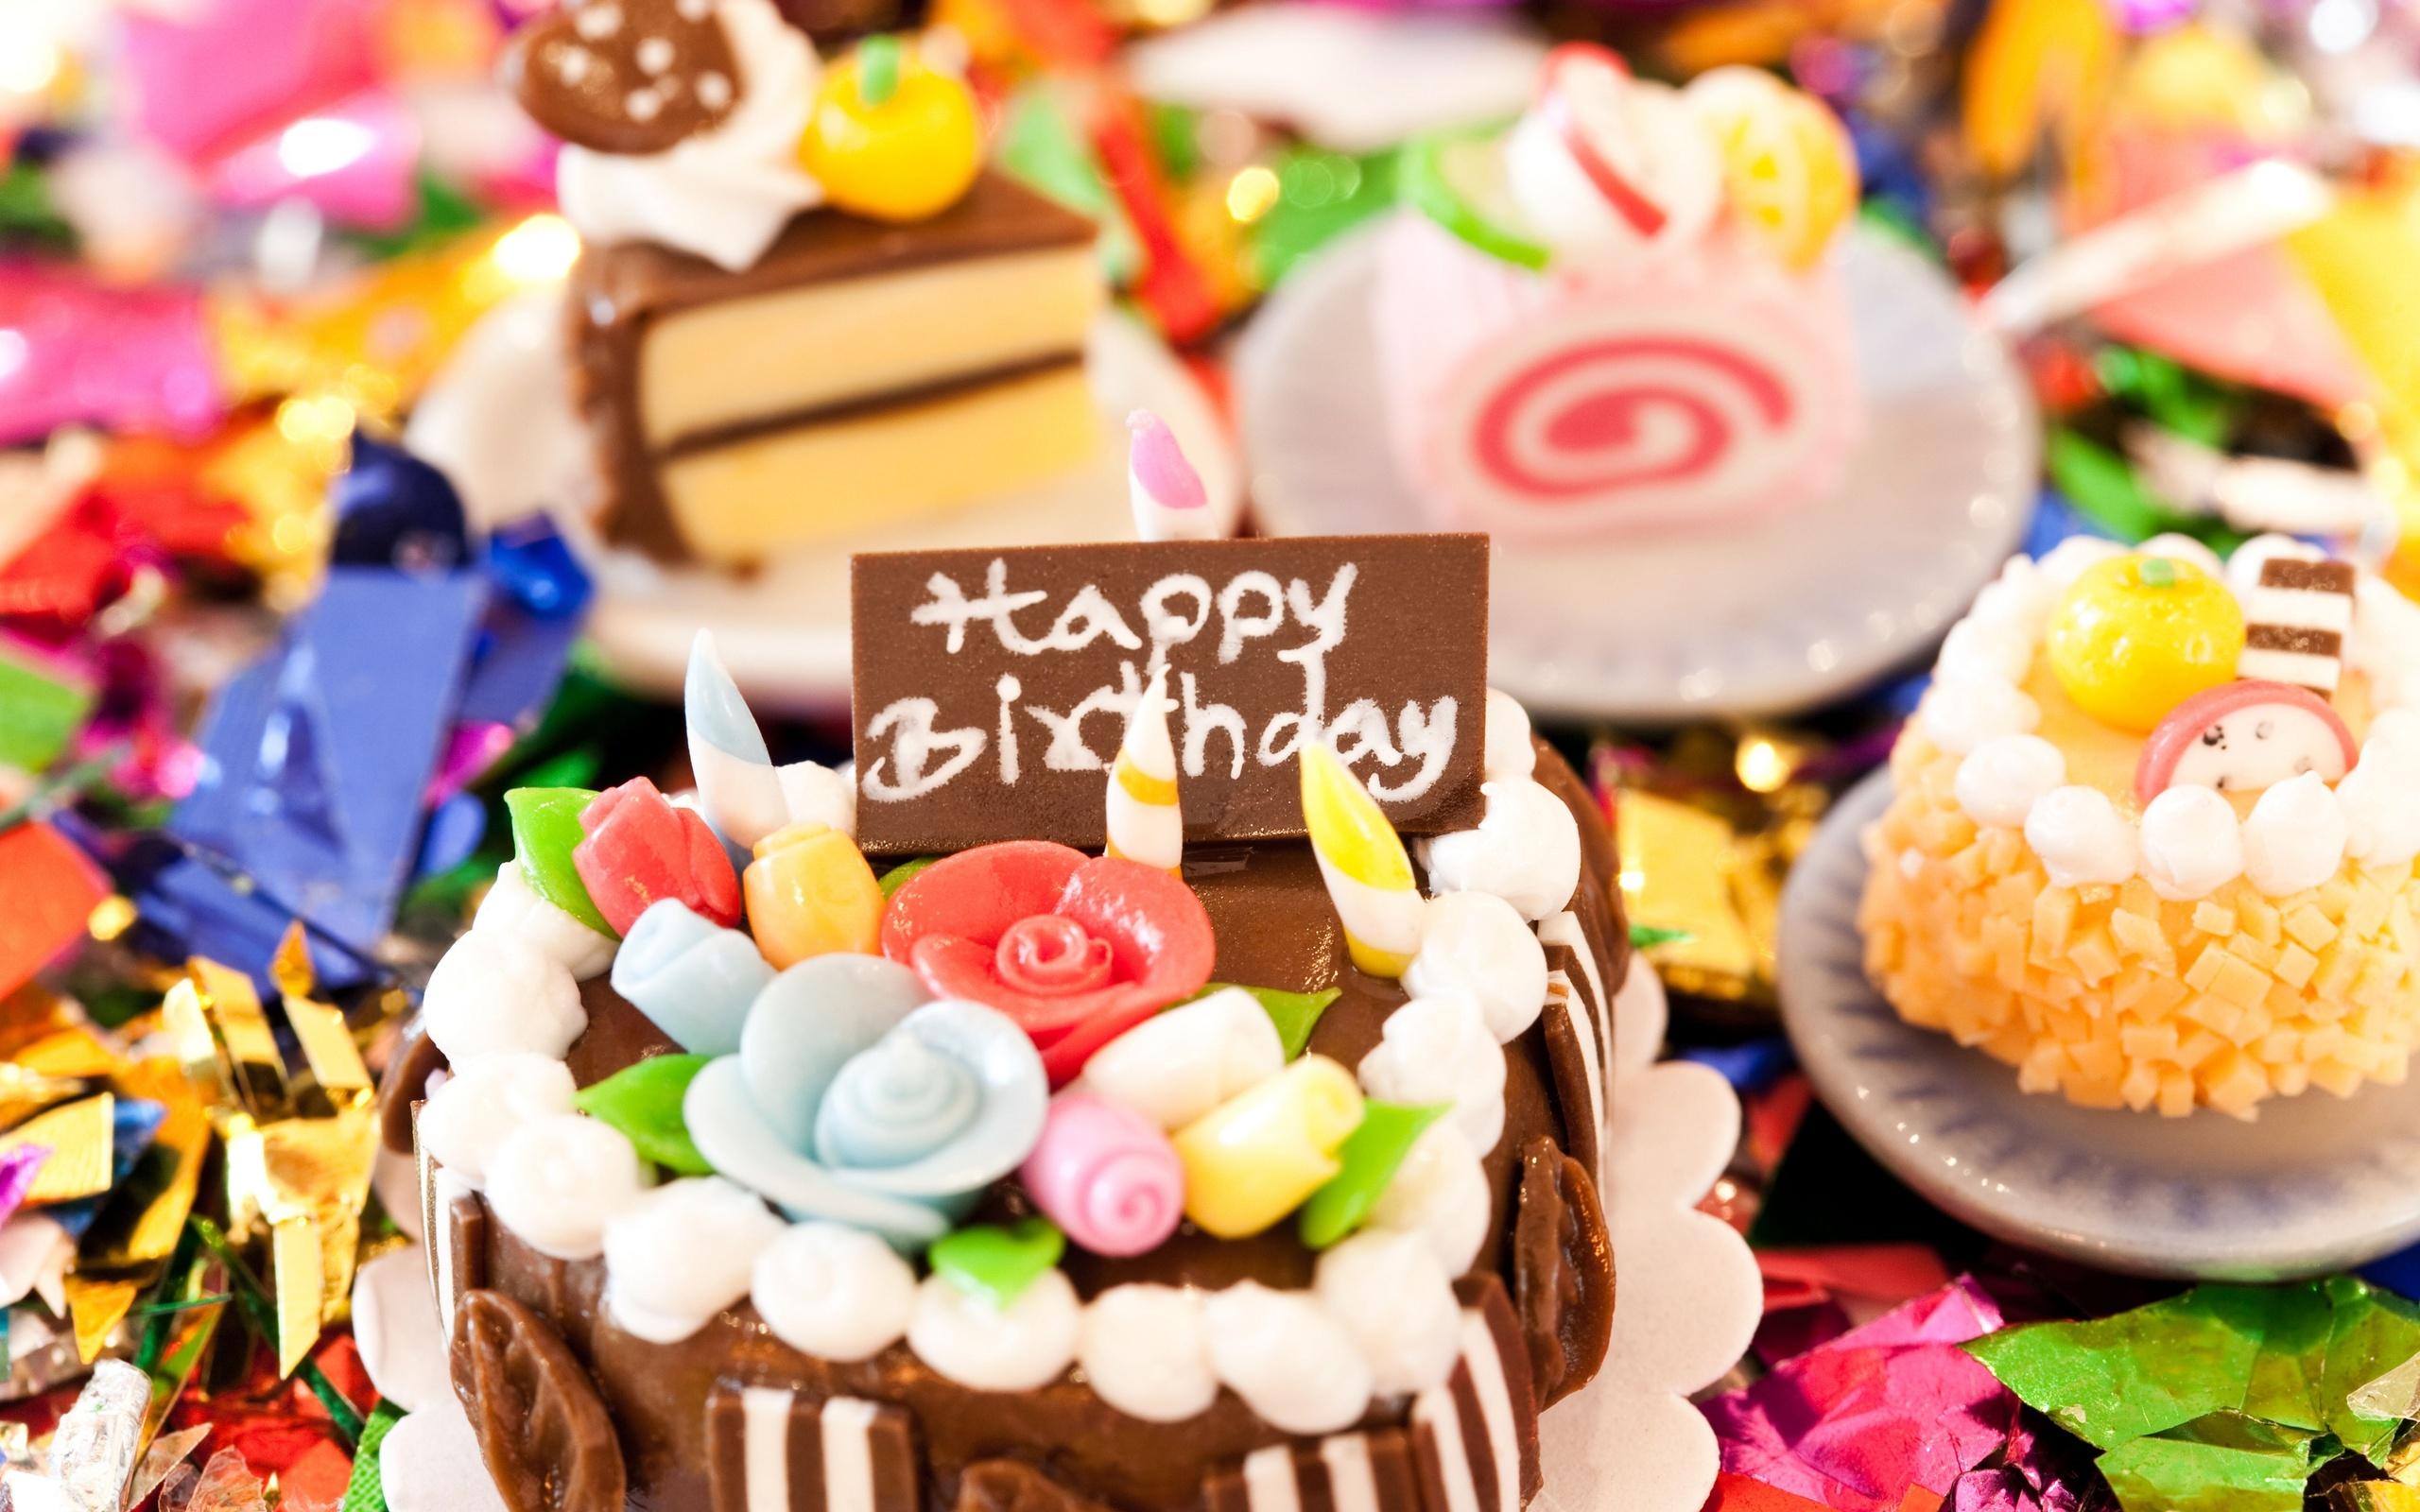 Открытки с днем рождения торт фото